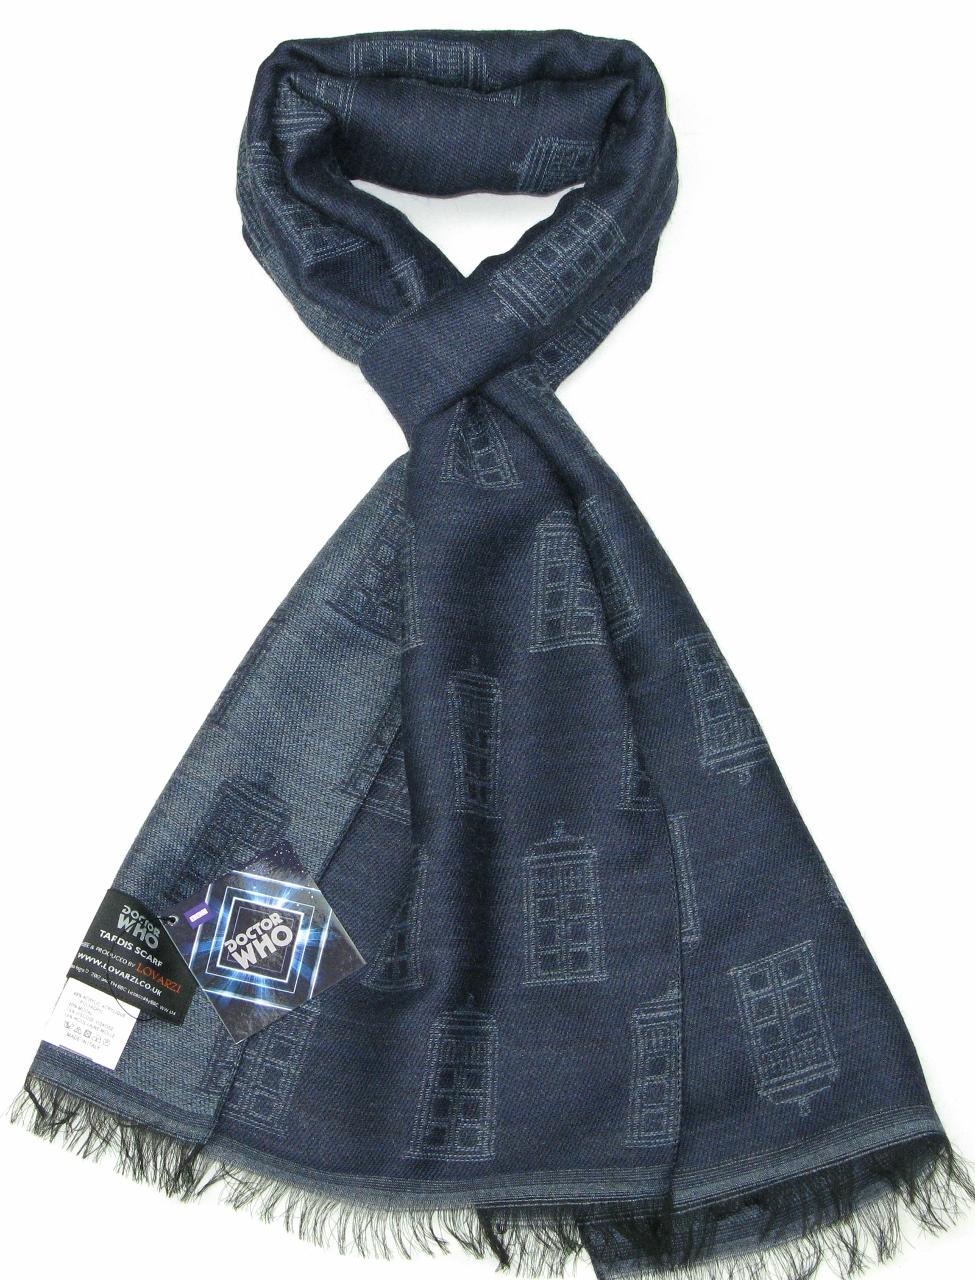 TARDIS Scarf (Blue & Grey) (Credit: Lovarzi)